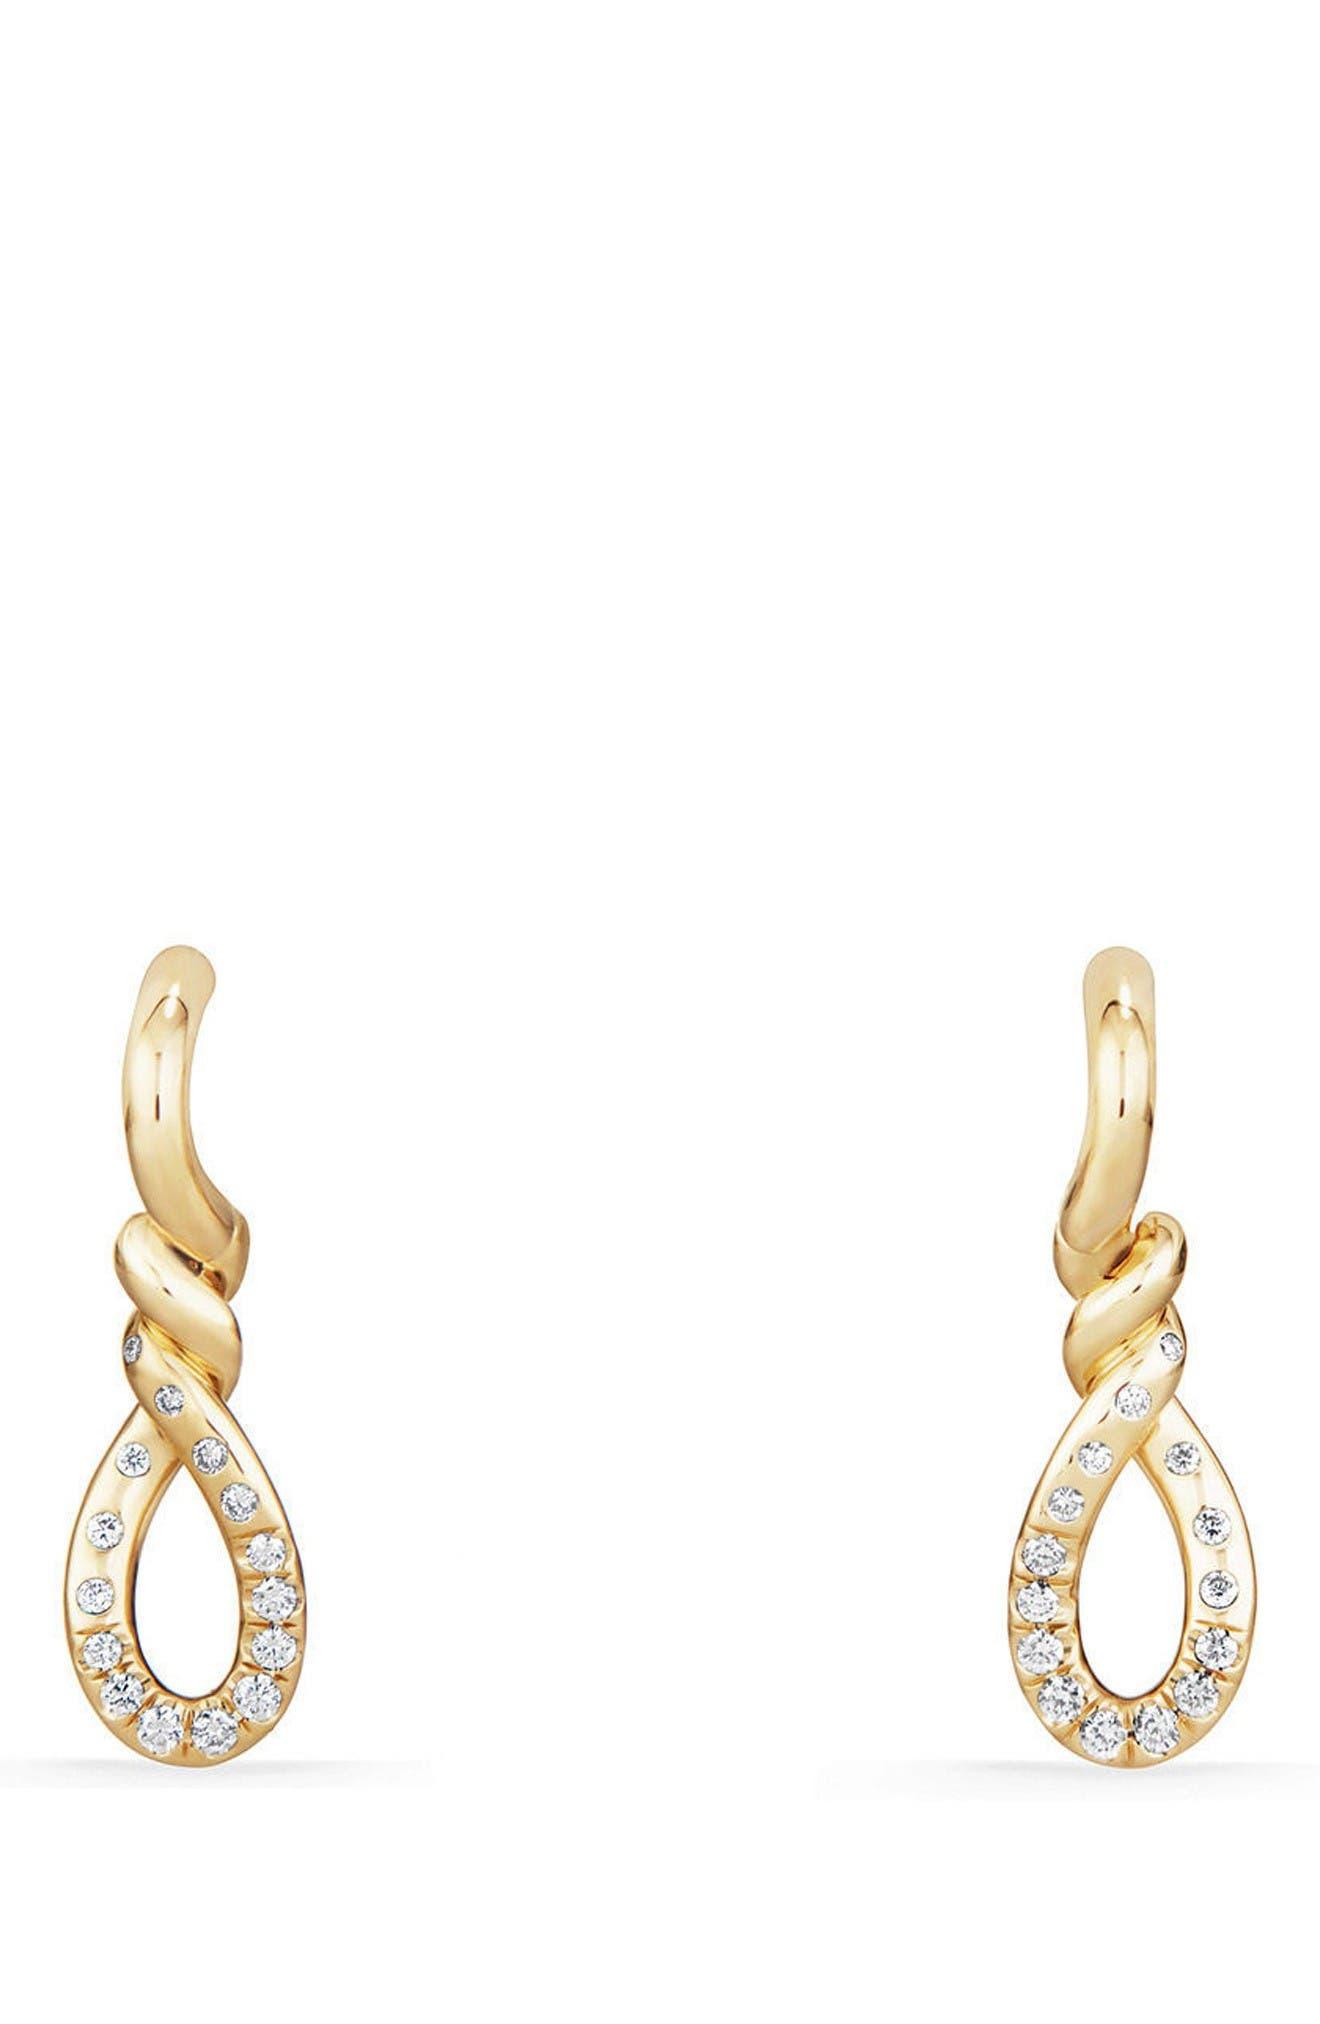 David Yurman Continuance Drop Earrings in 18K Gold with Diamonds